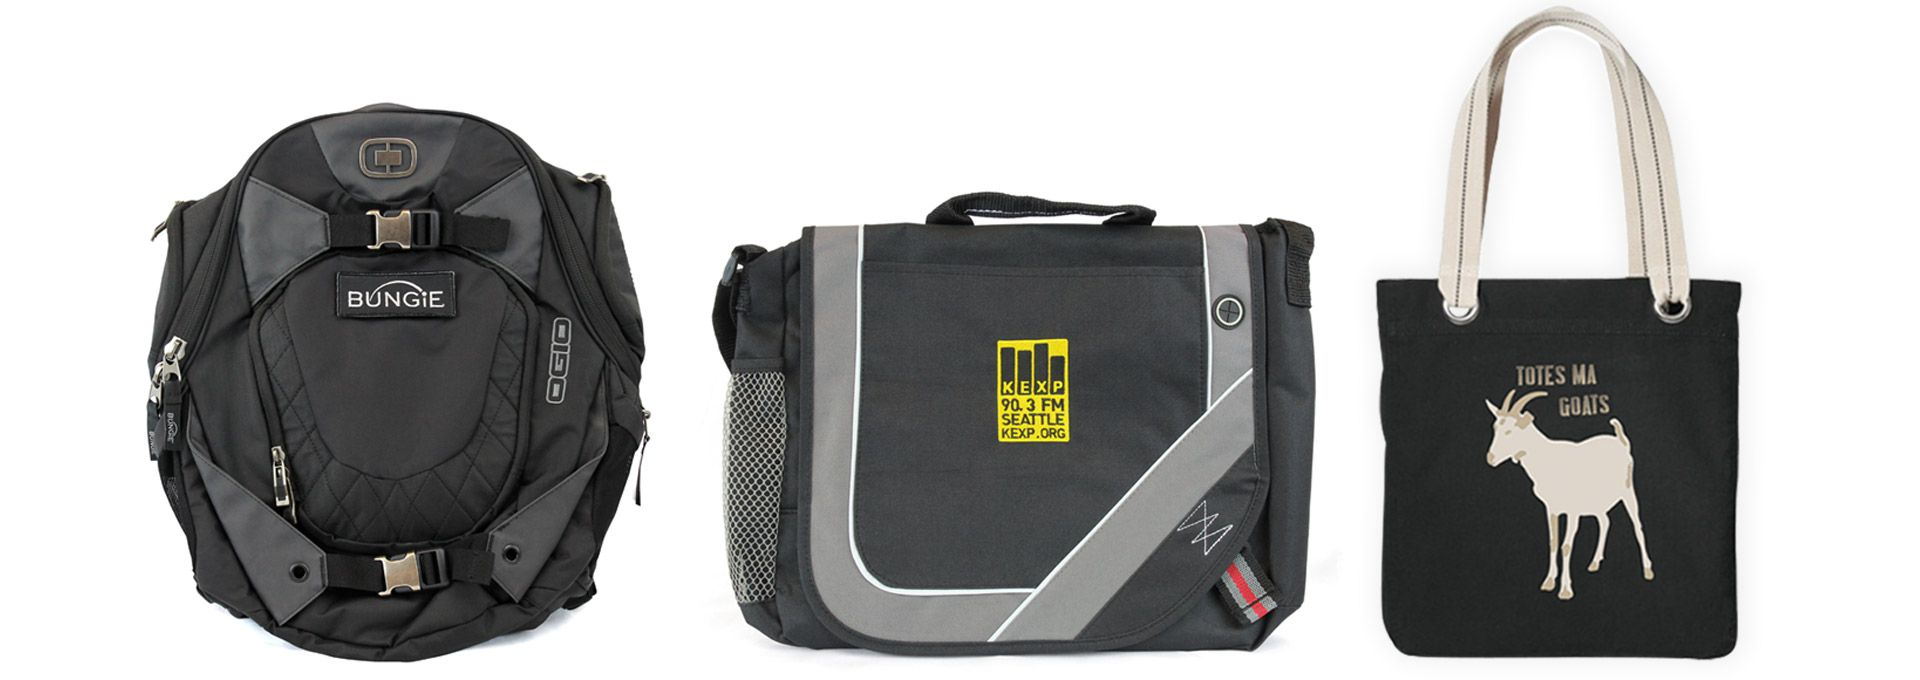 Custom Promotional Bags Seattle